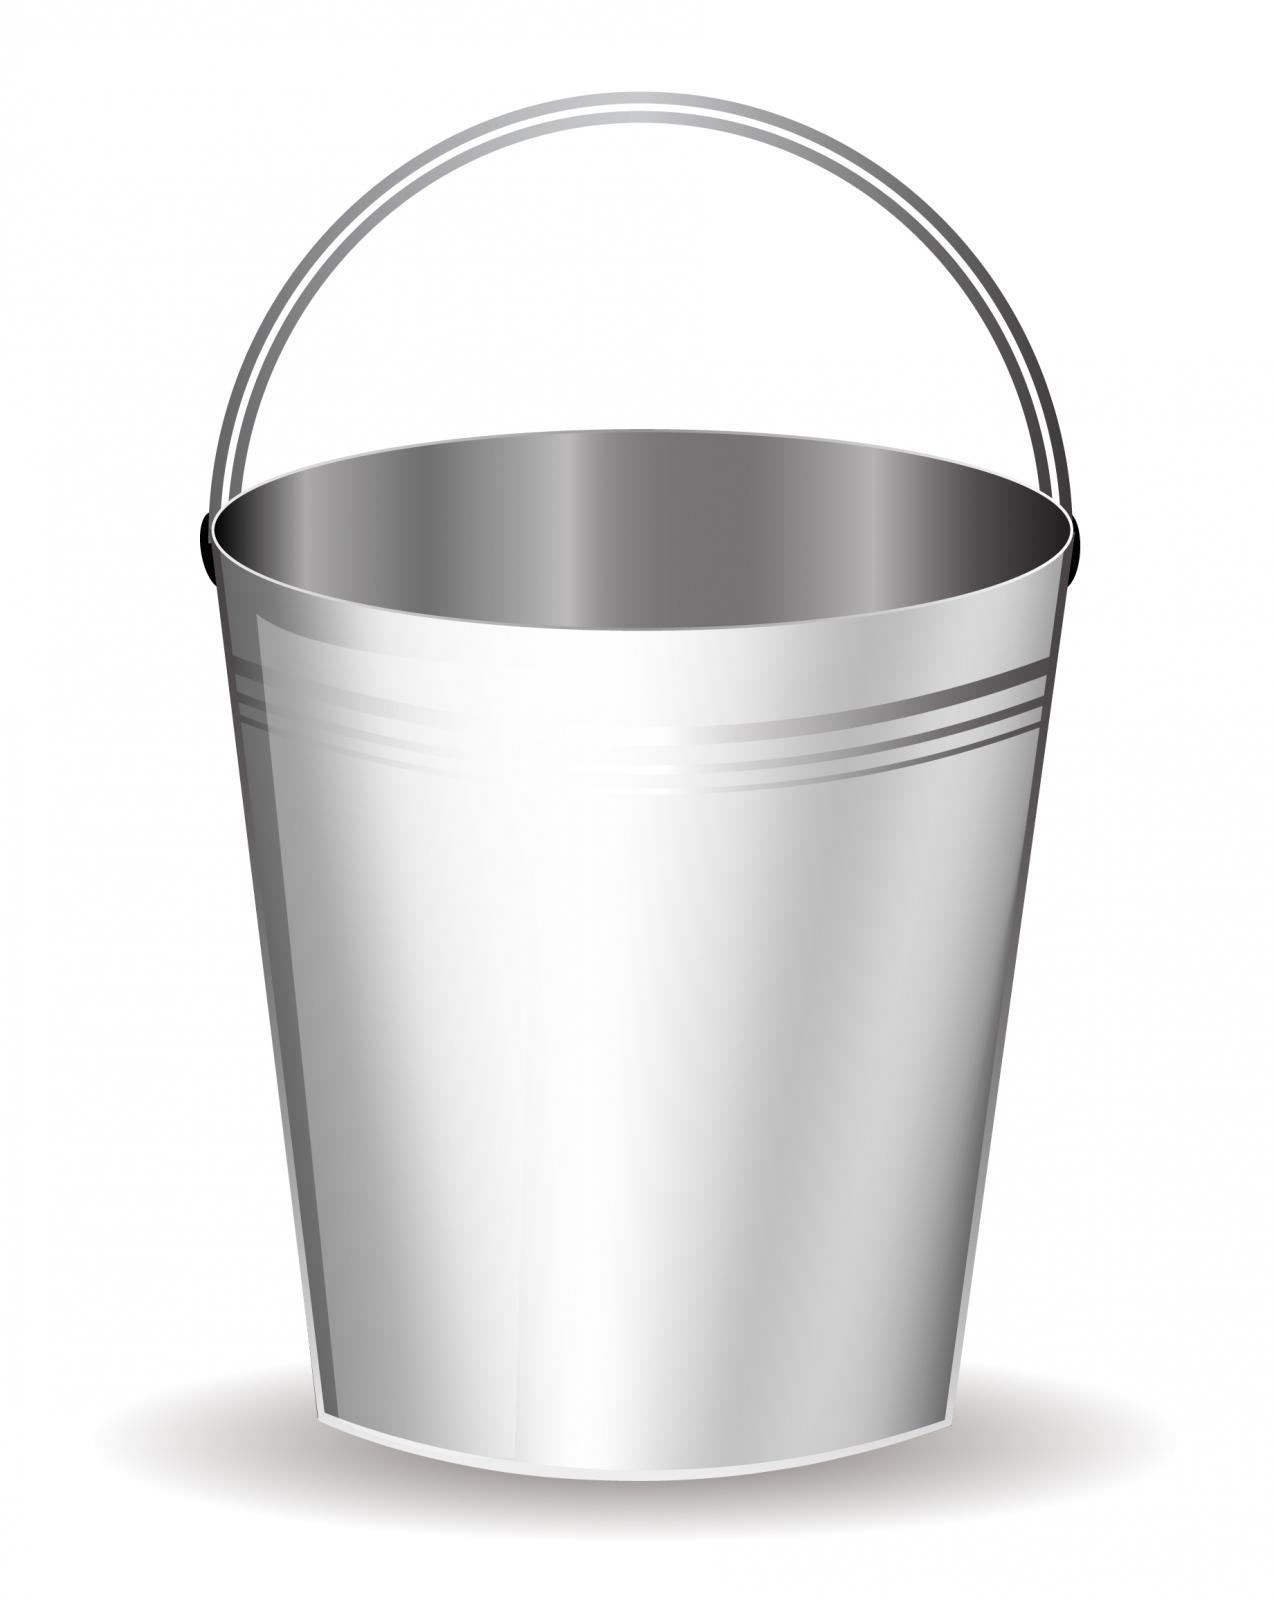 Clip art jpg clipartix. Bucket clipart silver bucket